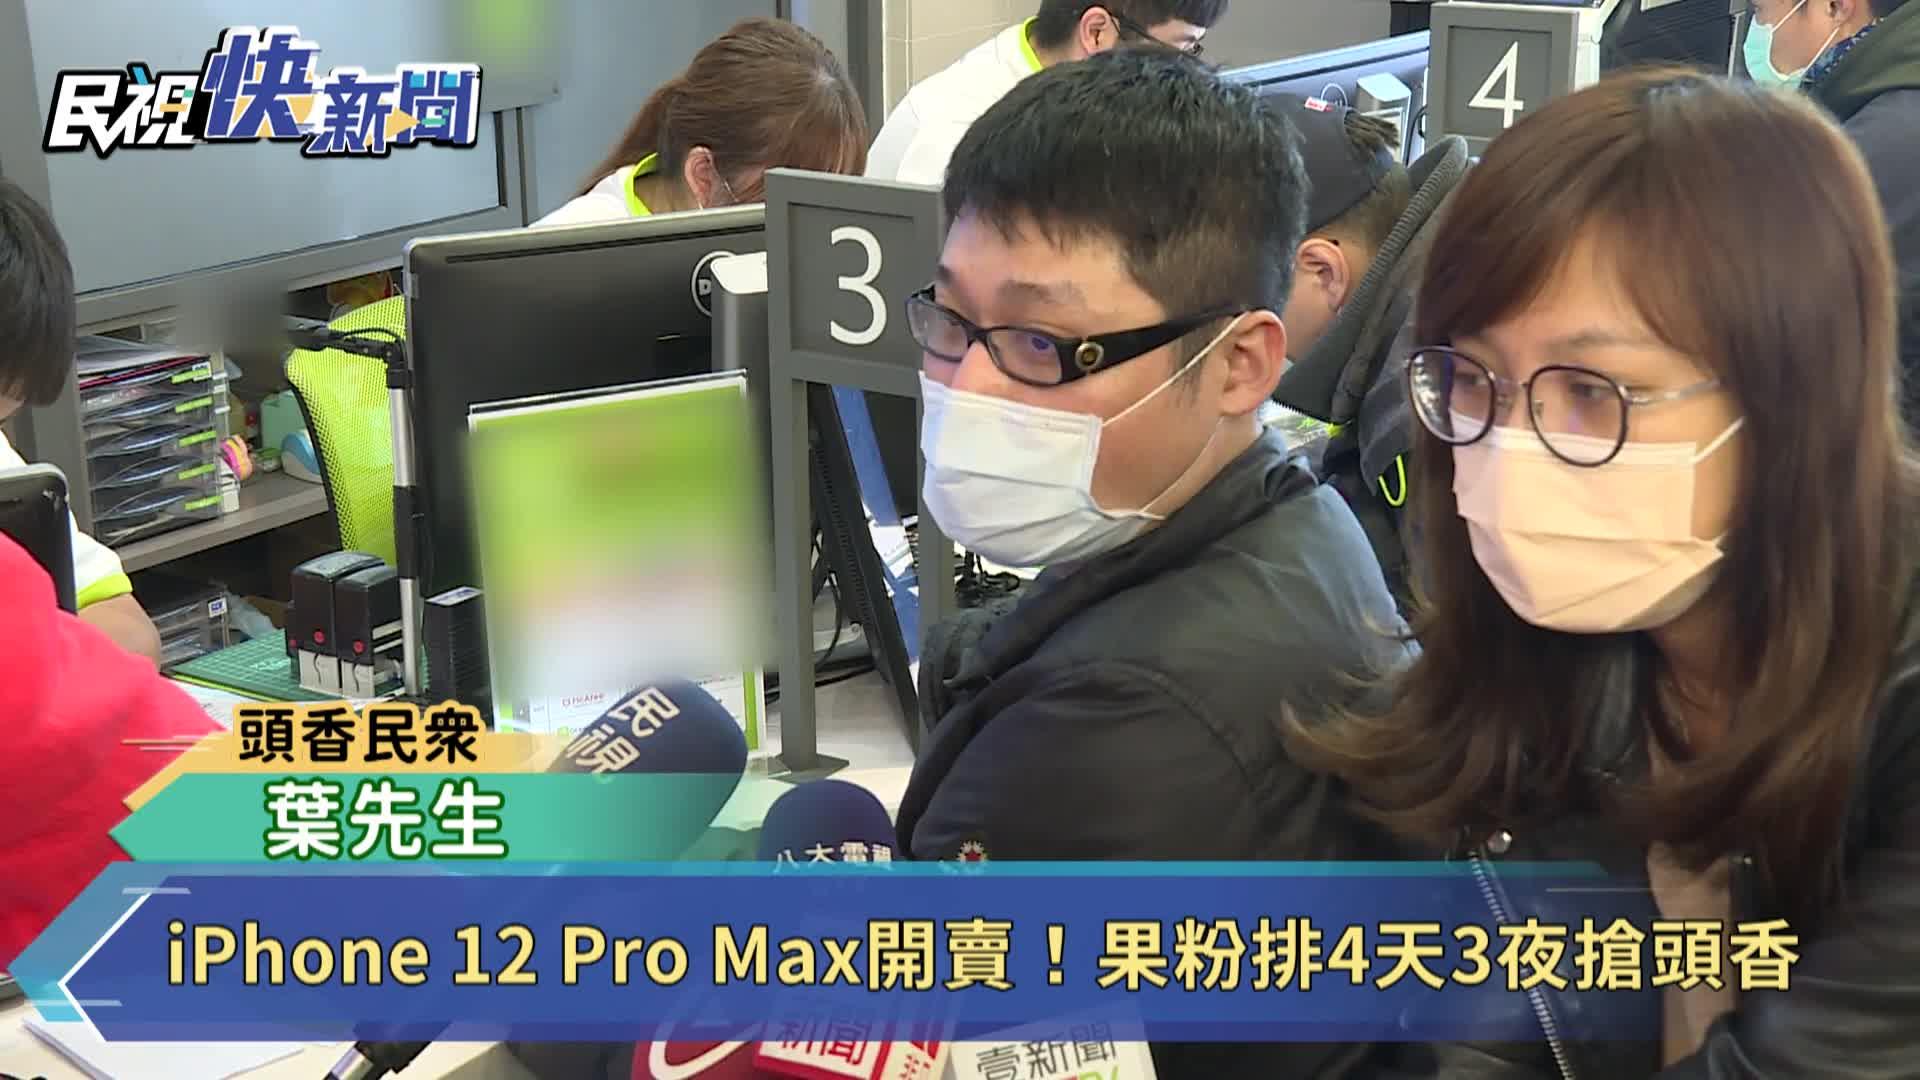 iPhone 12 Pro Max開賣!果粉排4天3夜搶頭香